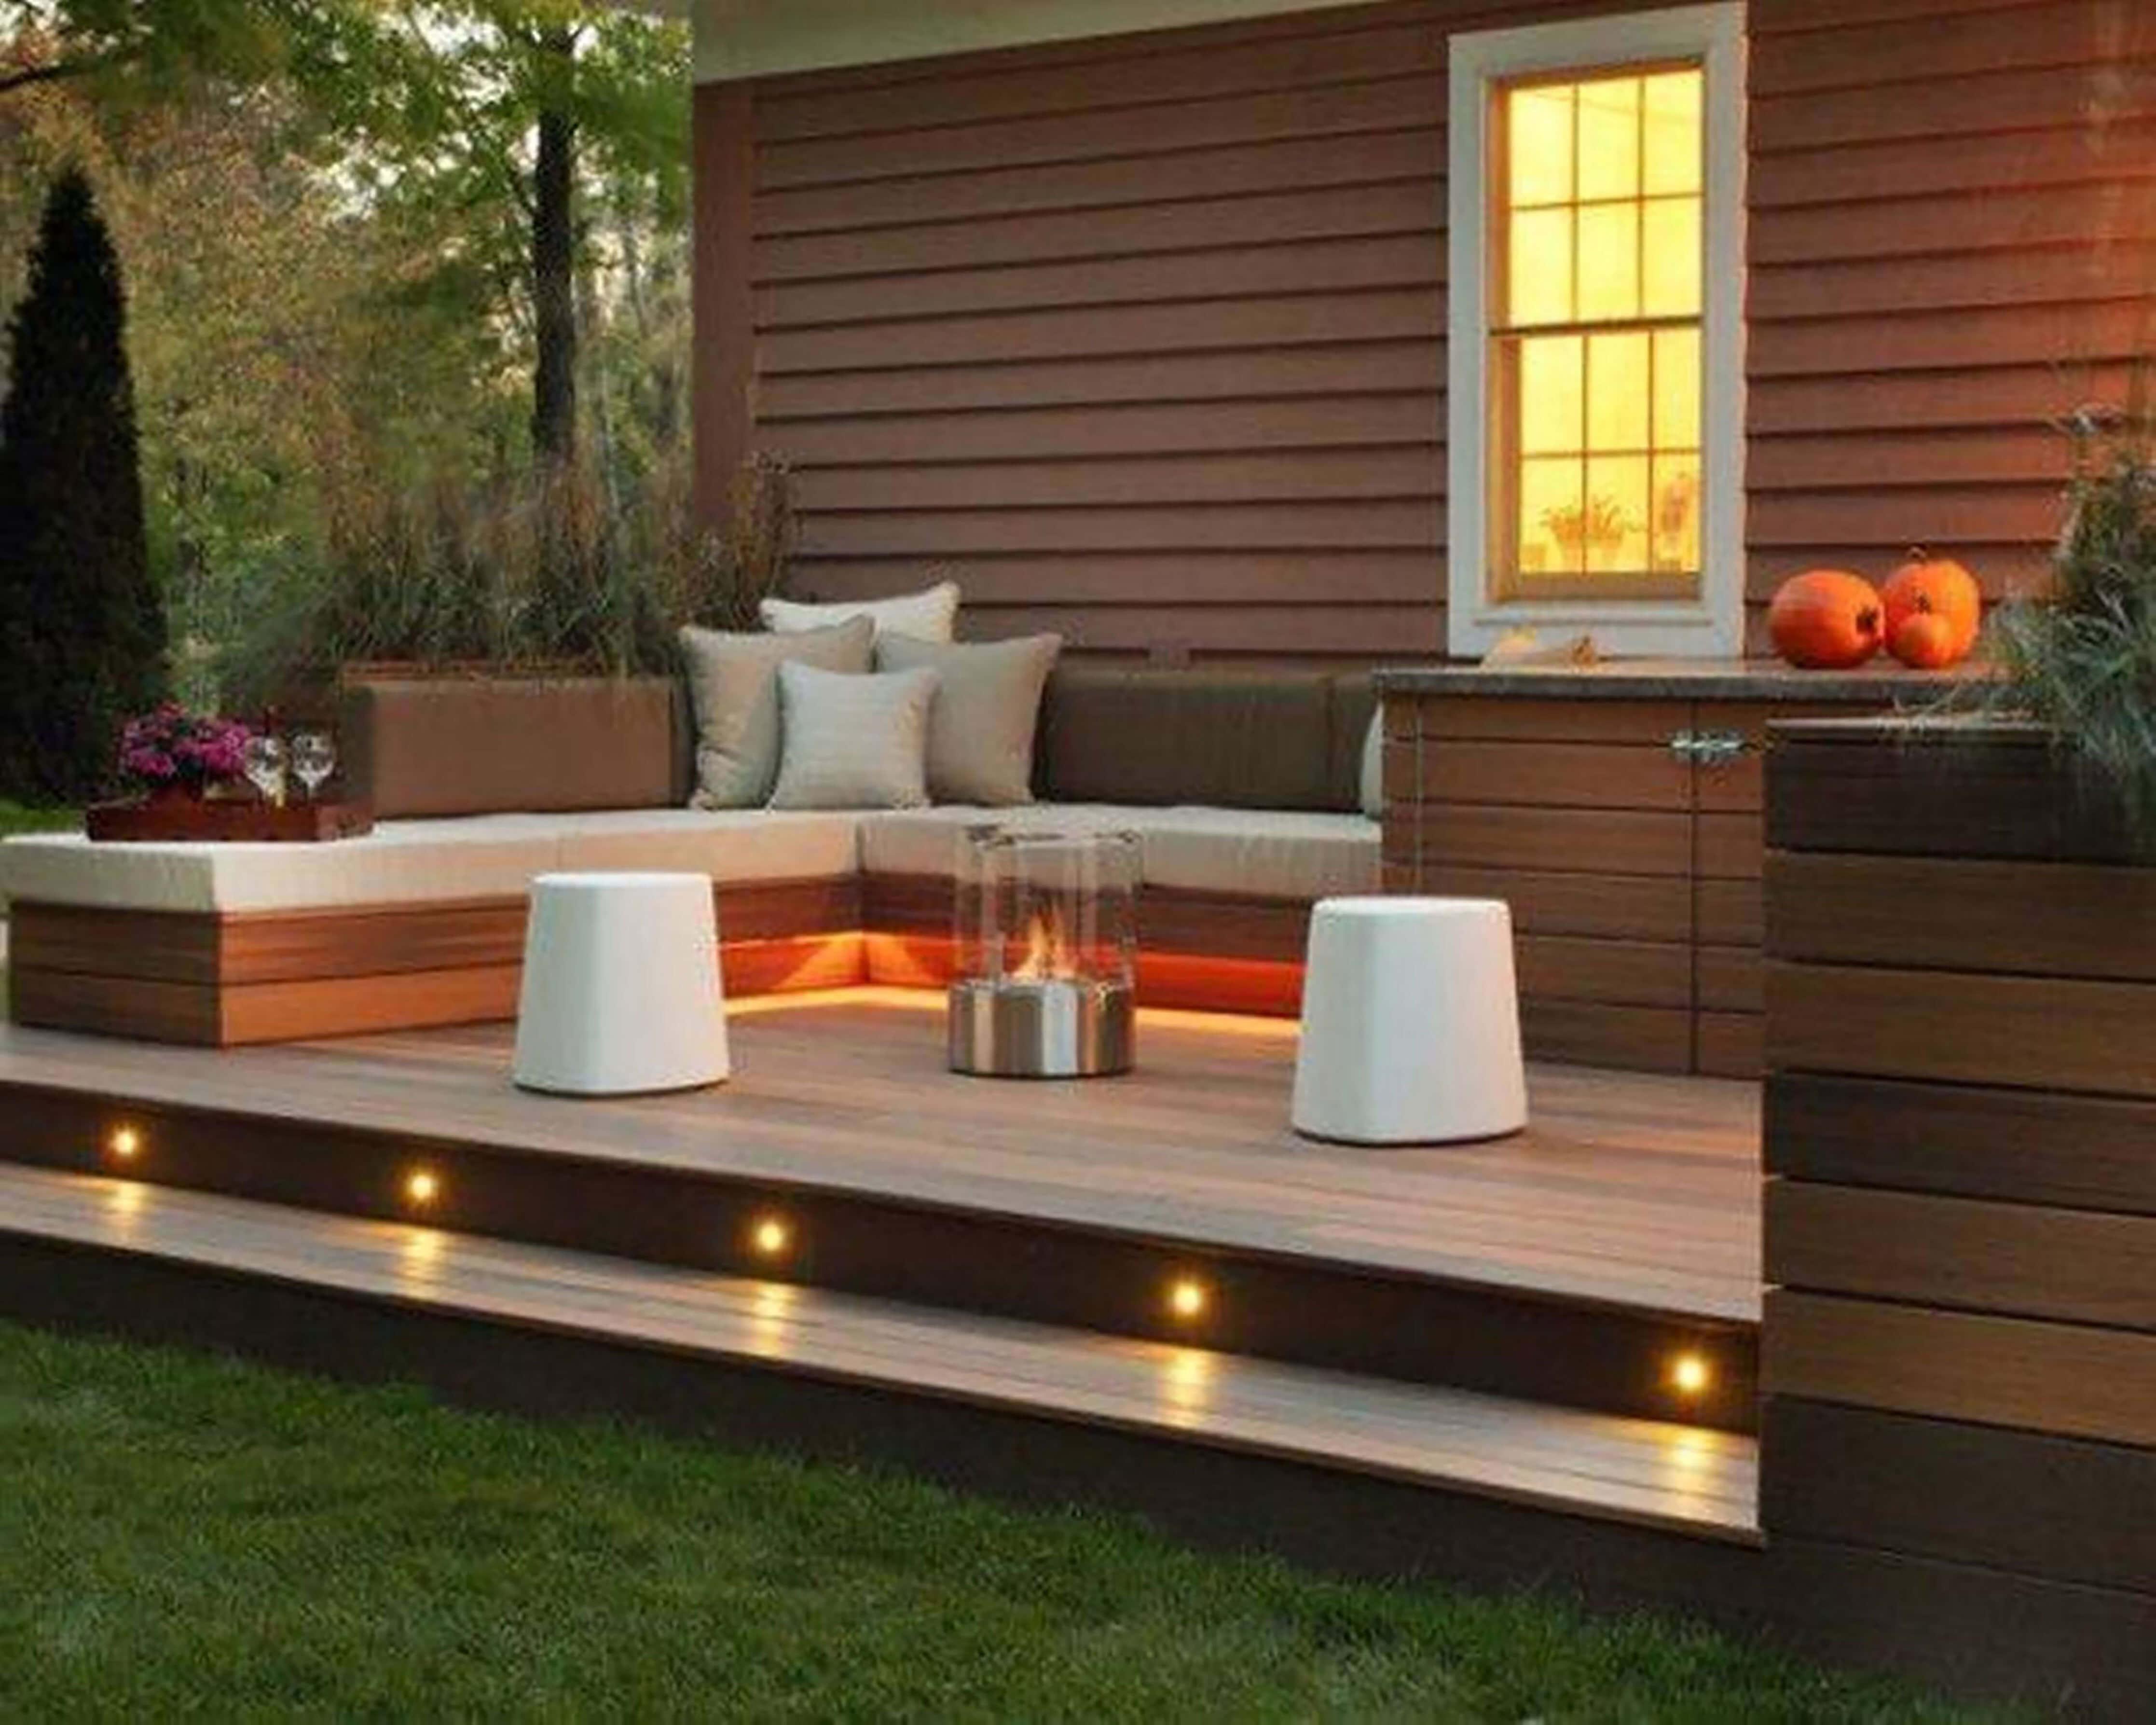 Deck Designs Small Backyards